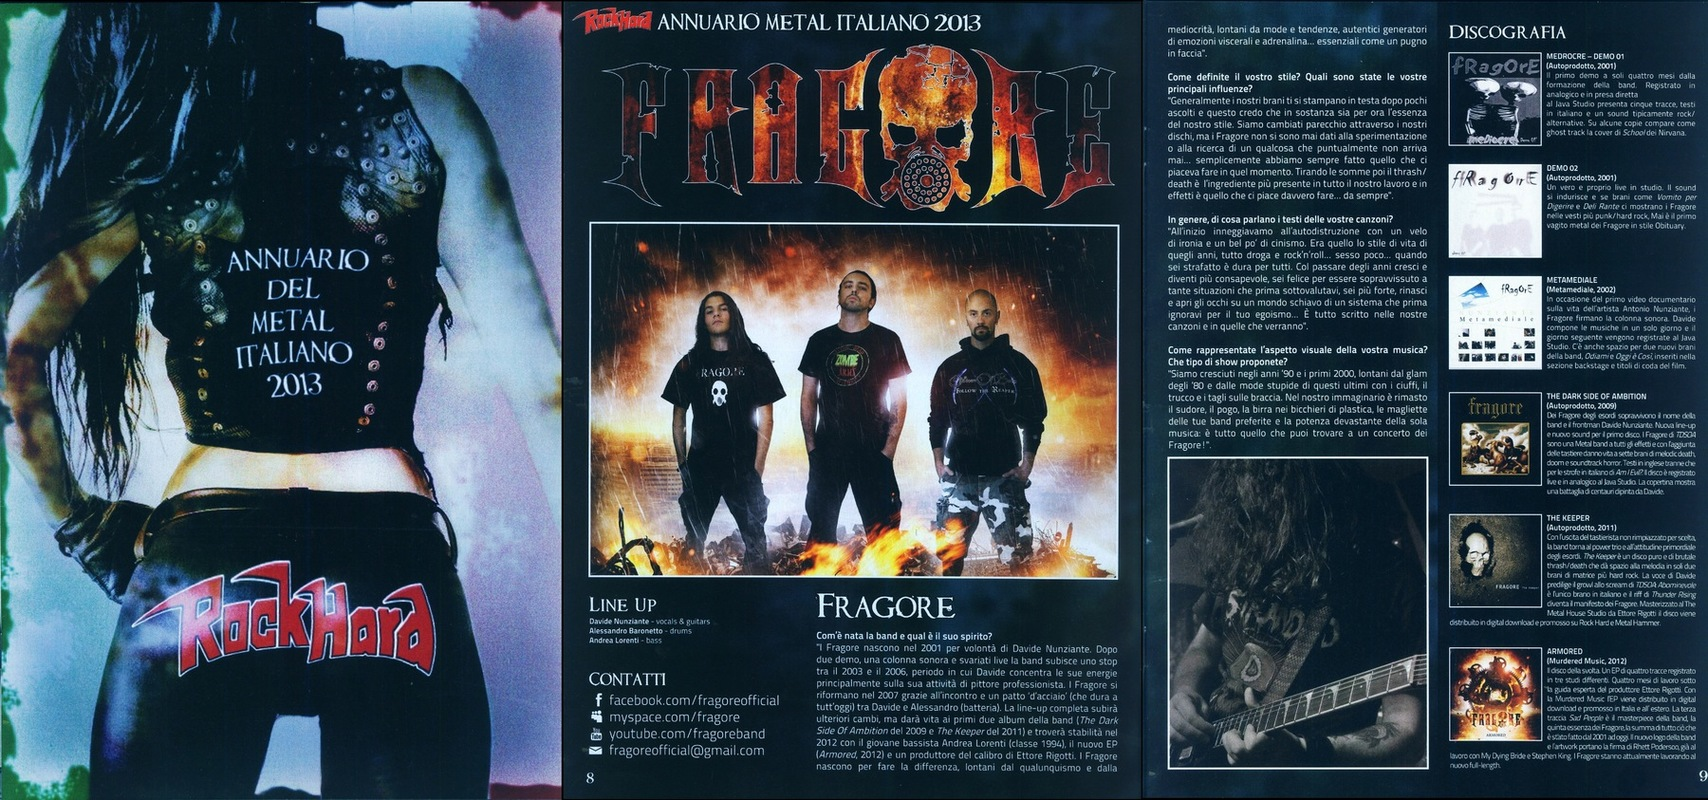 fragore - Annuario del metal italiano, Rock Hard- 2013